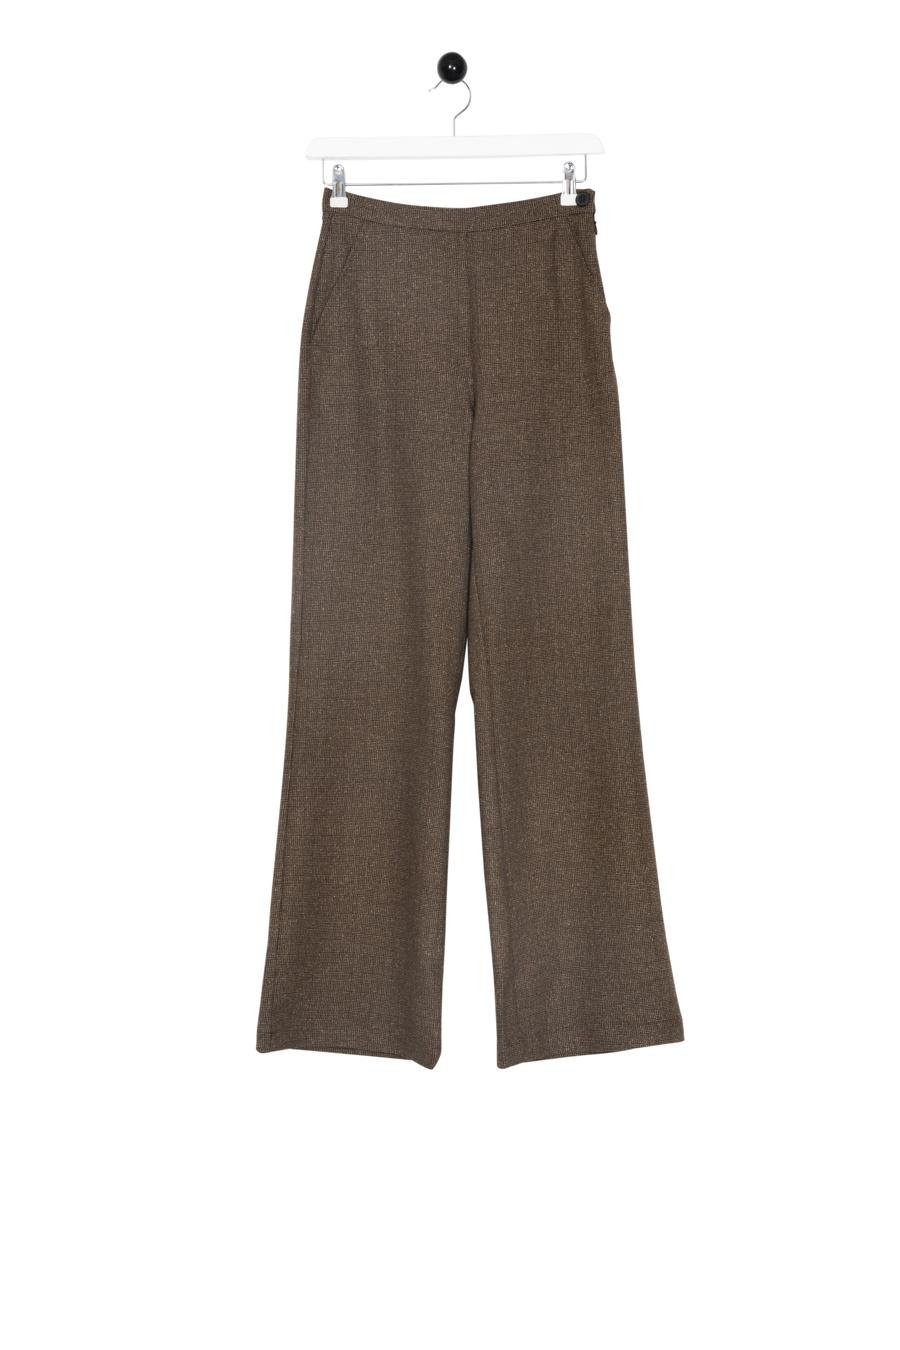 Return Grevlunda Trousers W